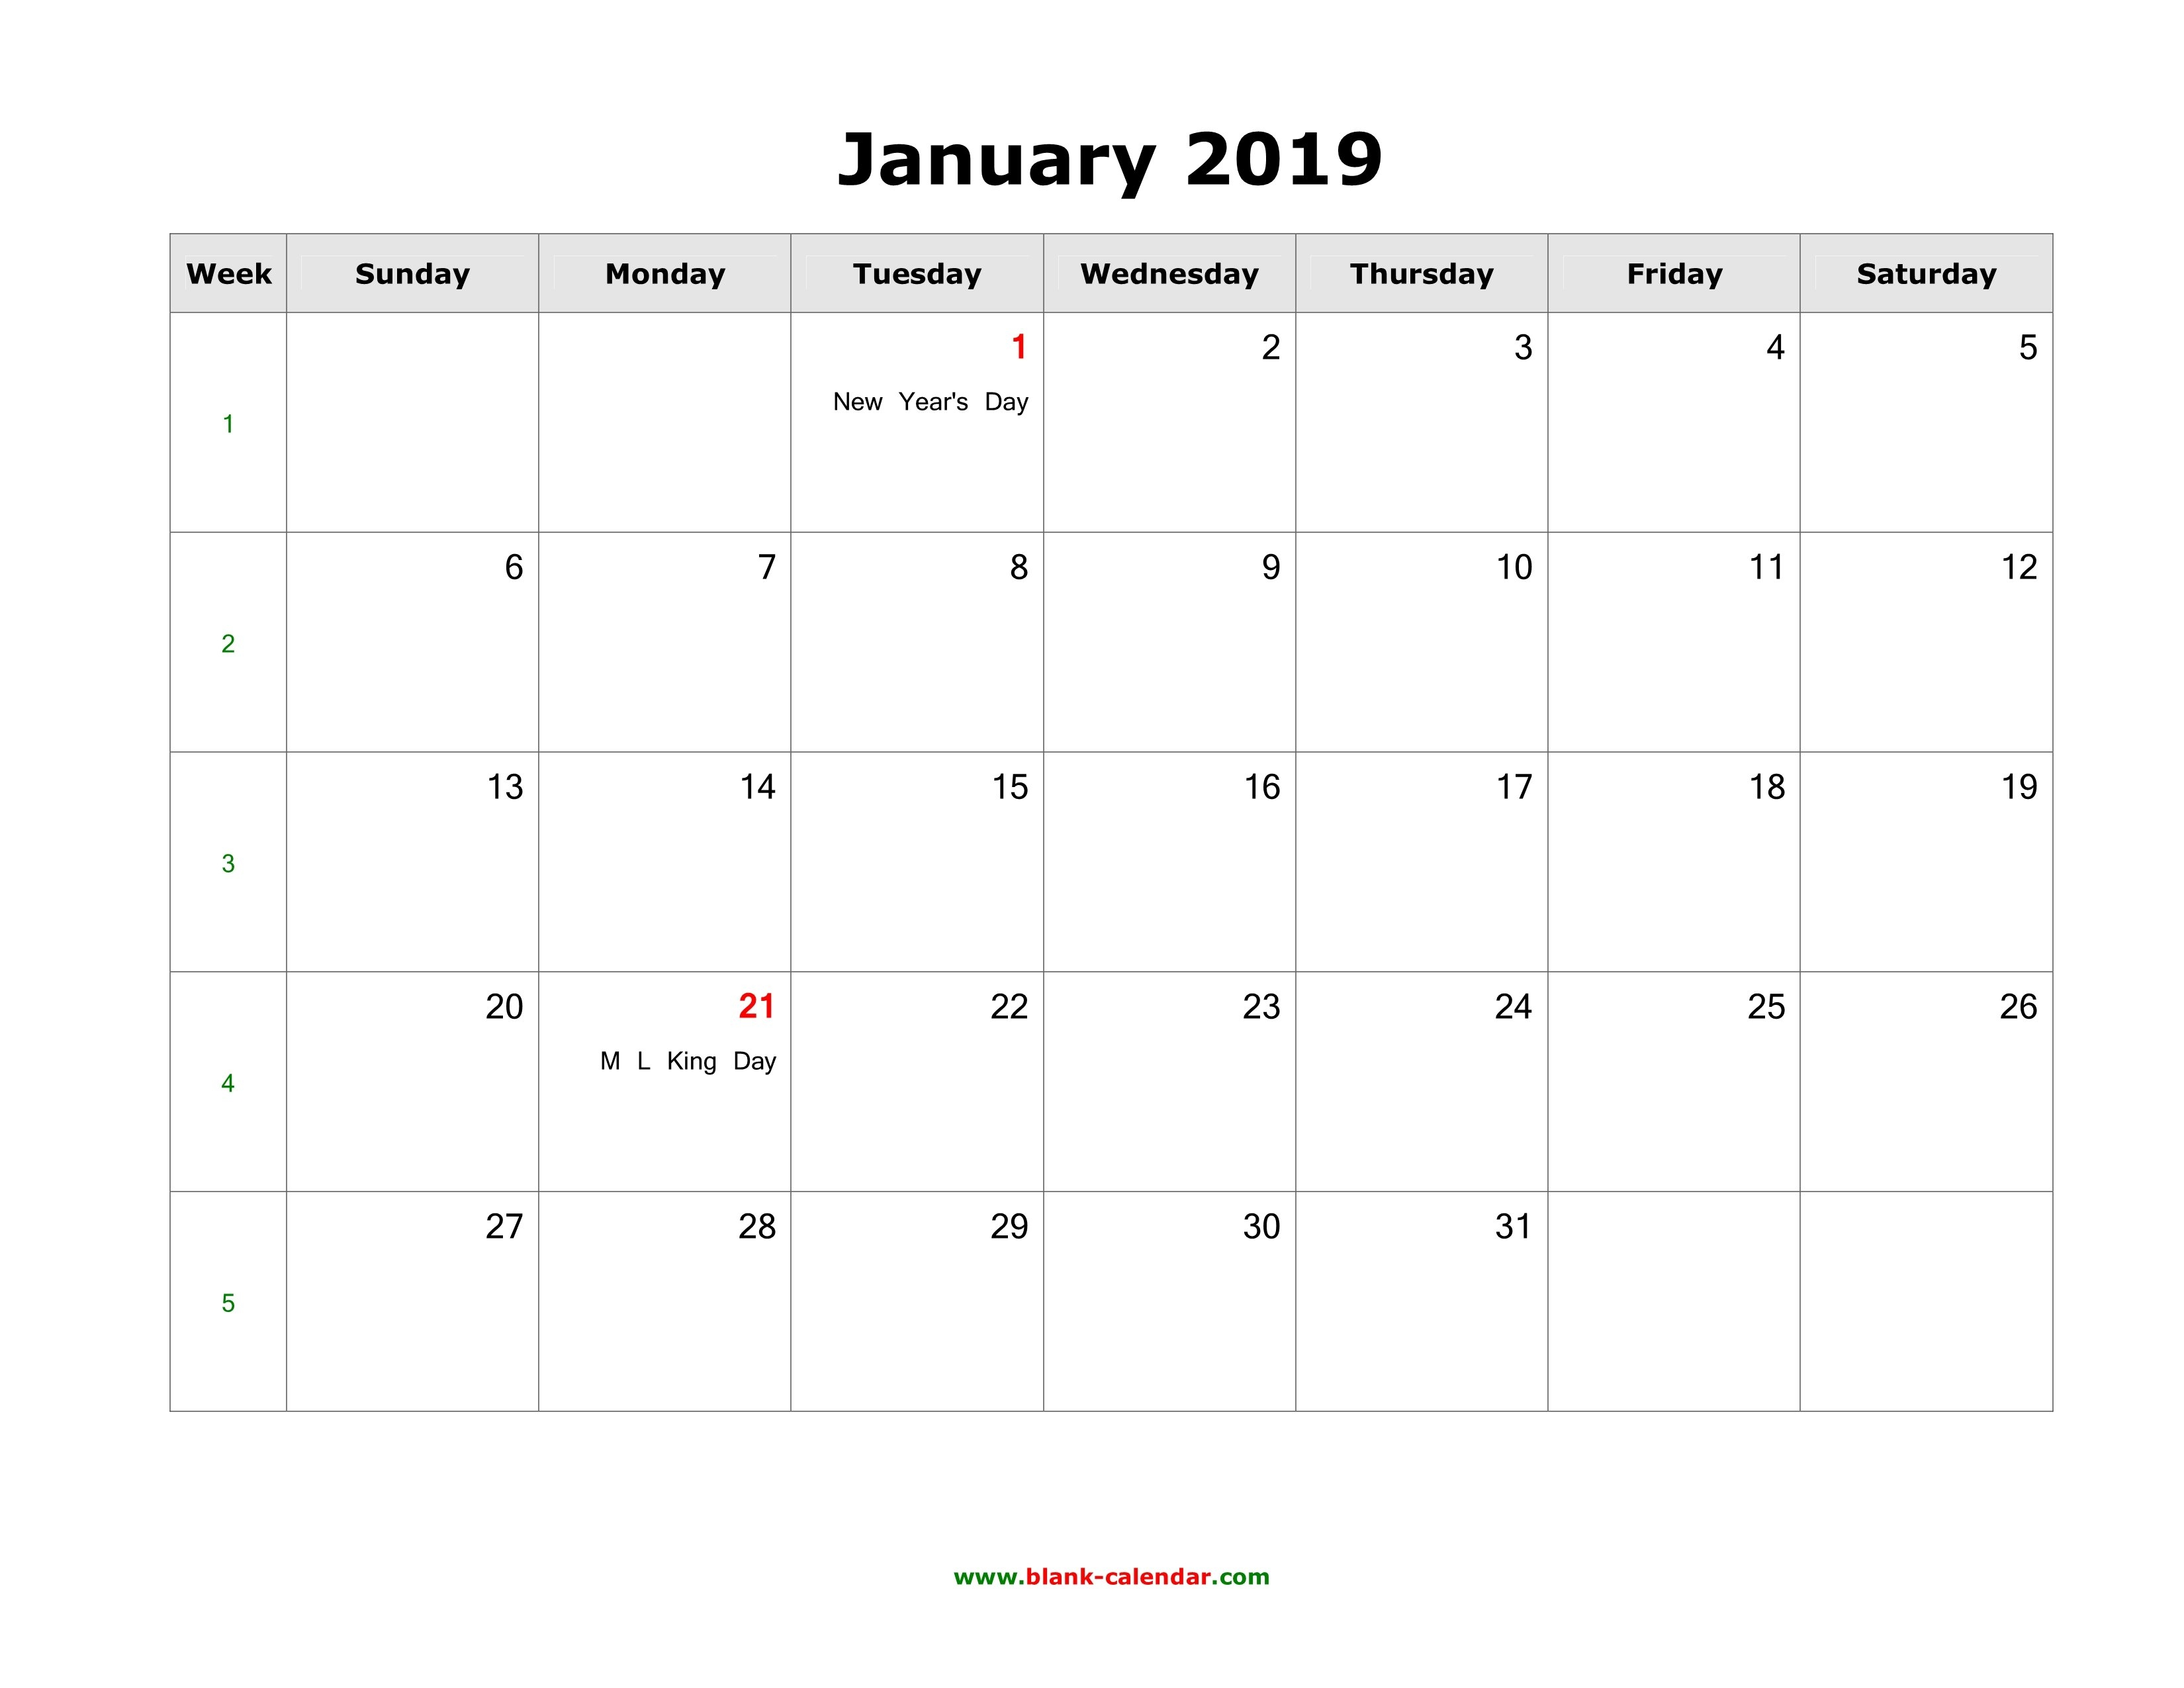 January 2019 Blank Calendar | Free Download Calendar Templates Calendar 2019 Jan